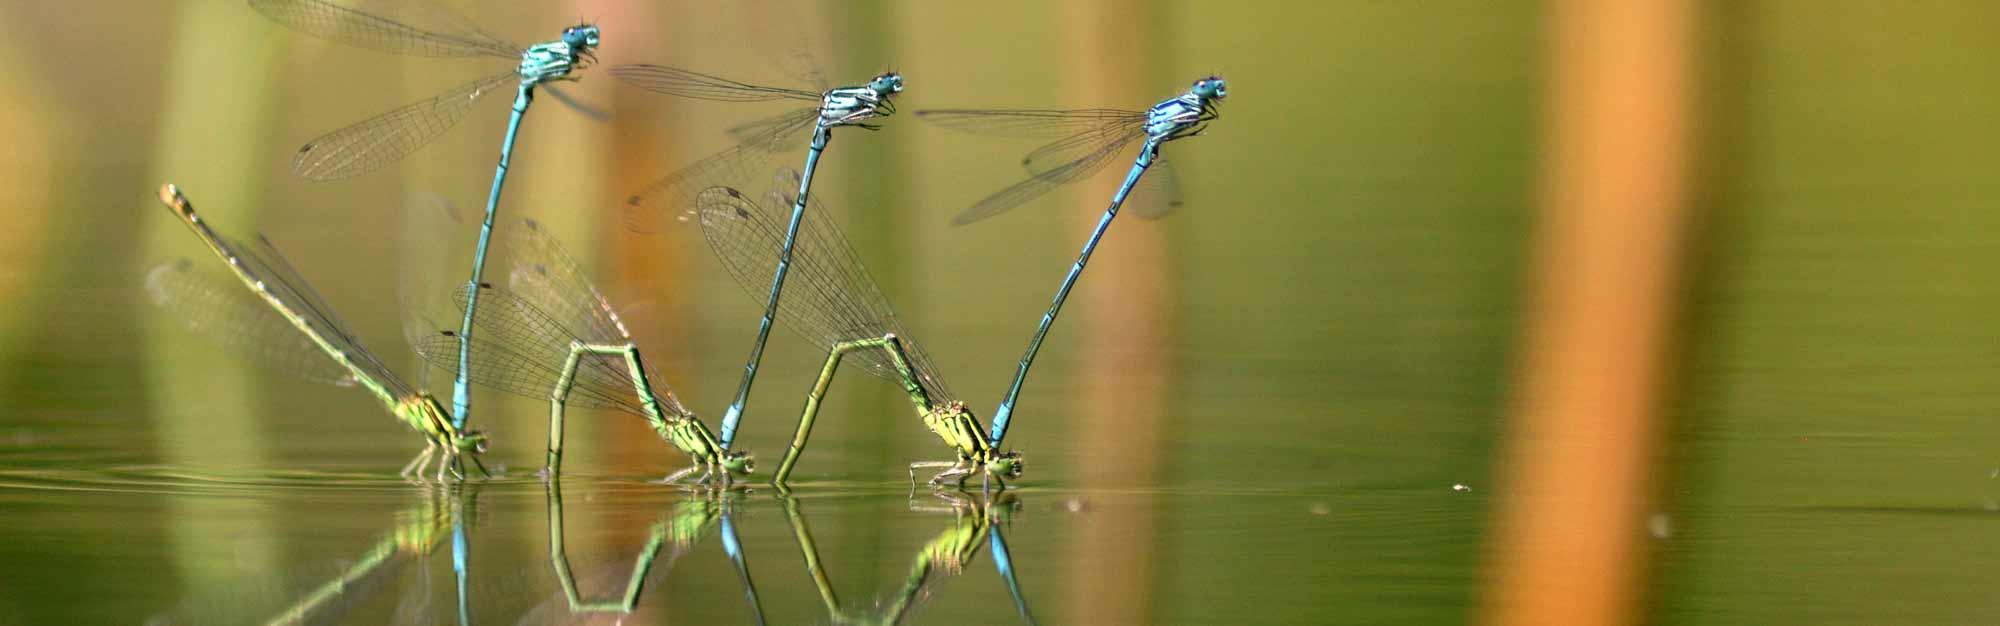 top_insekten.jpg